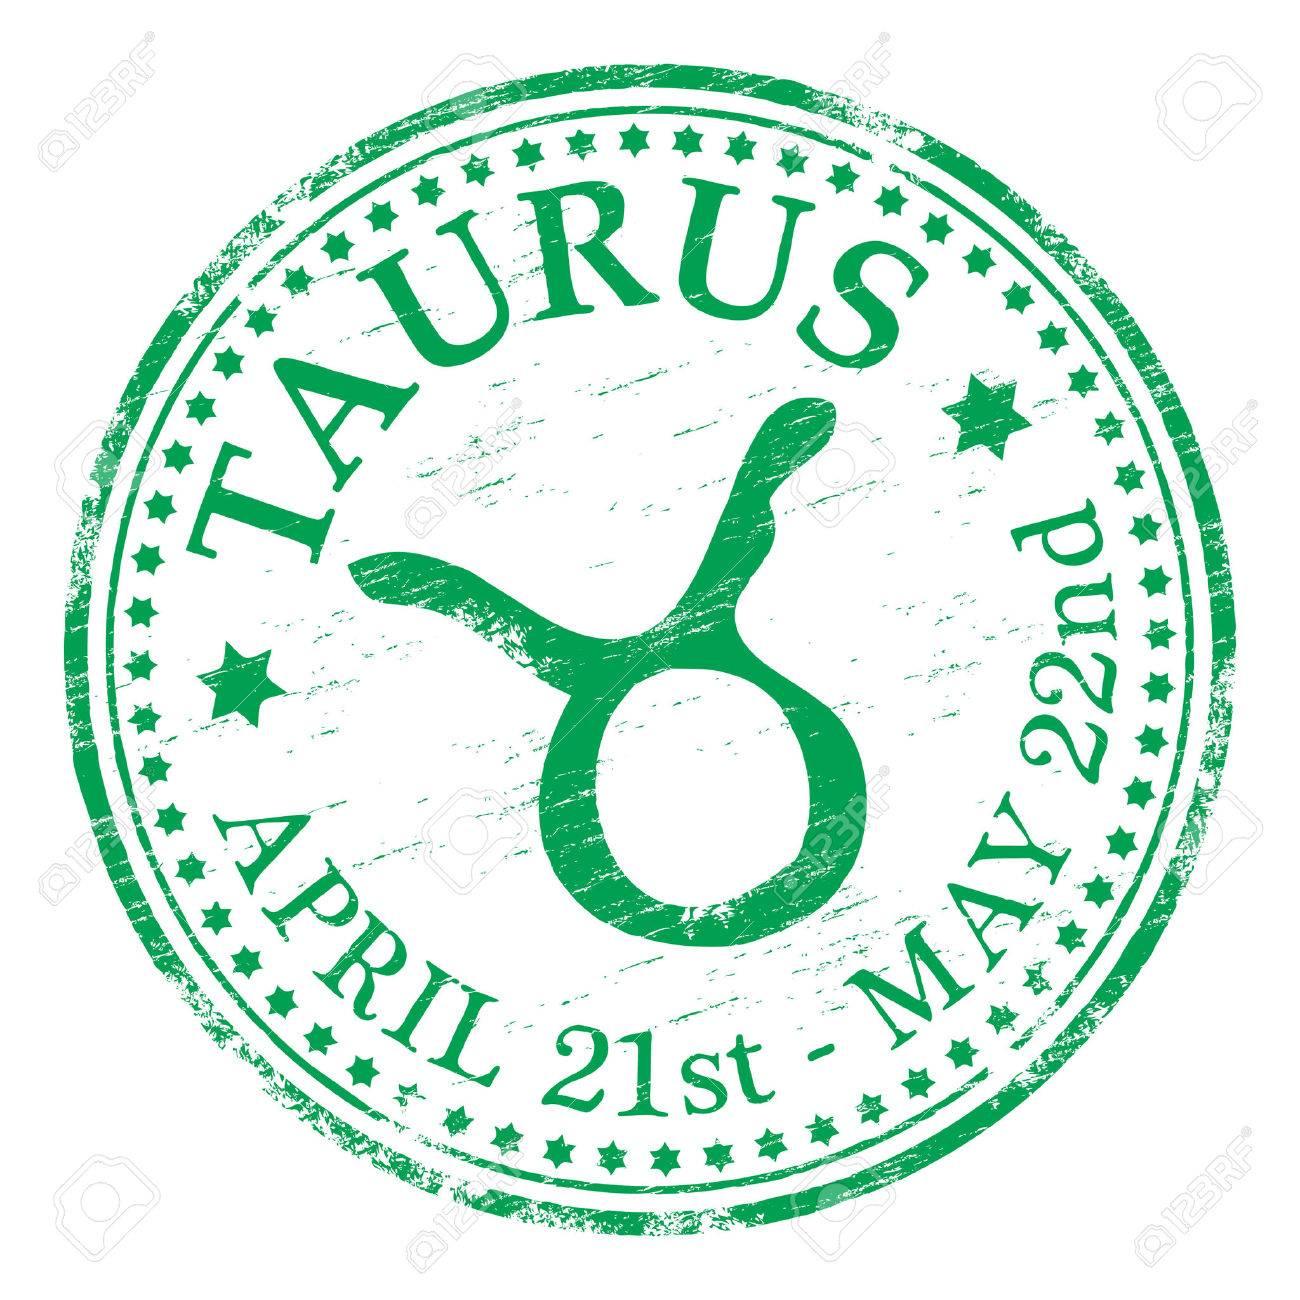 TAURUS Zodiac Rubber Stamp Stock Vector - 8984752